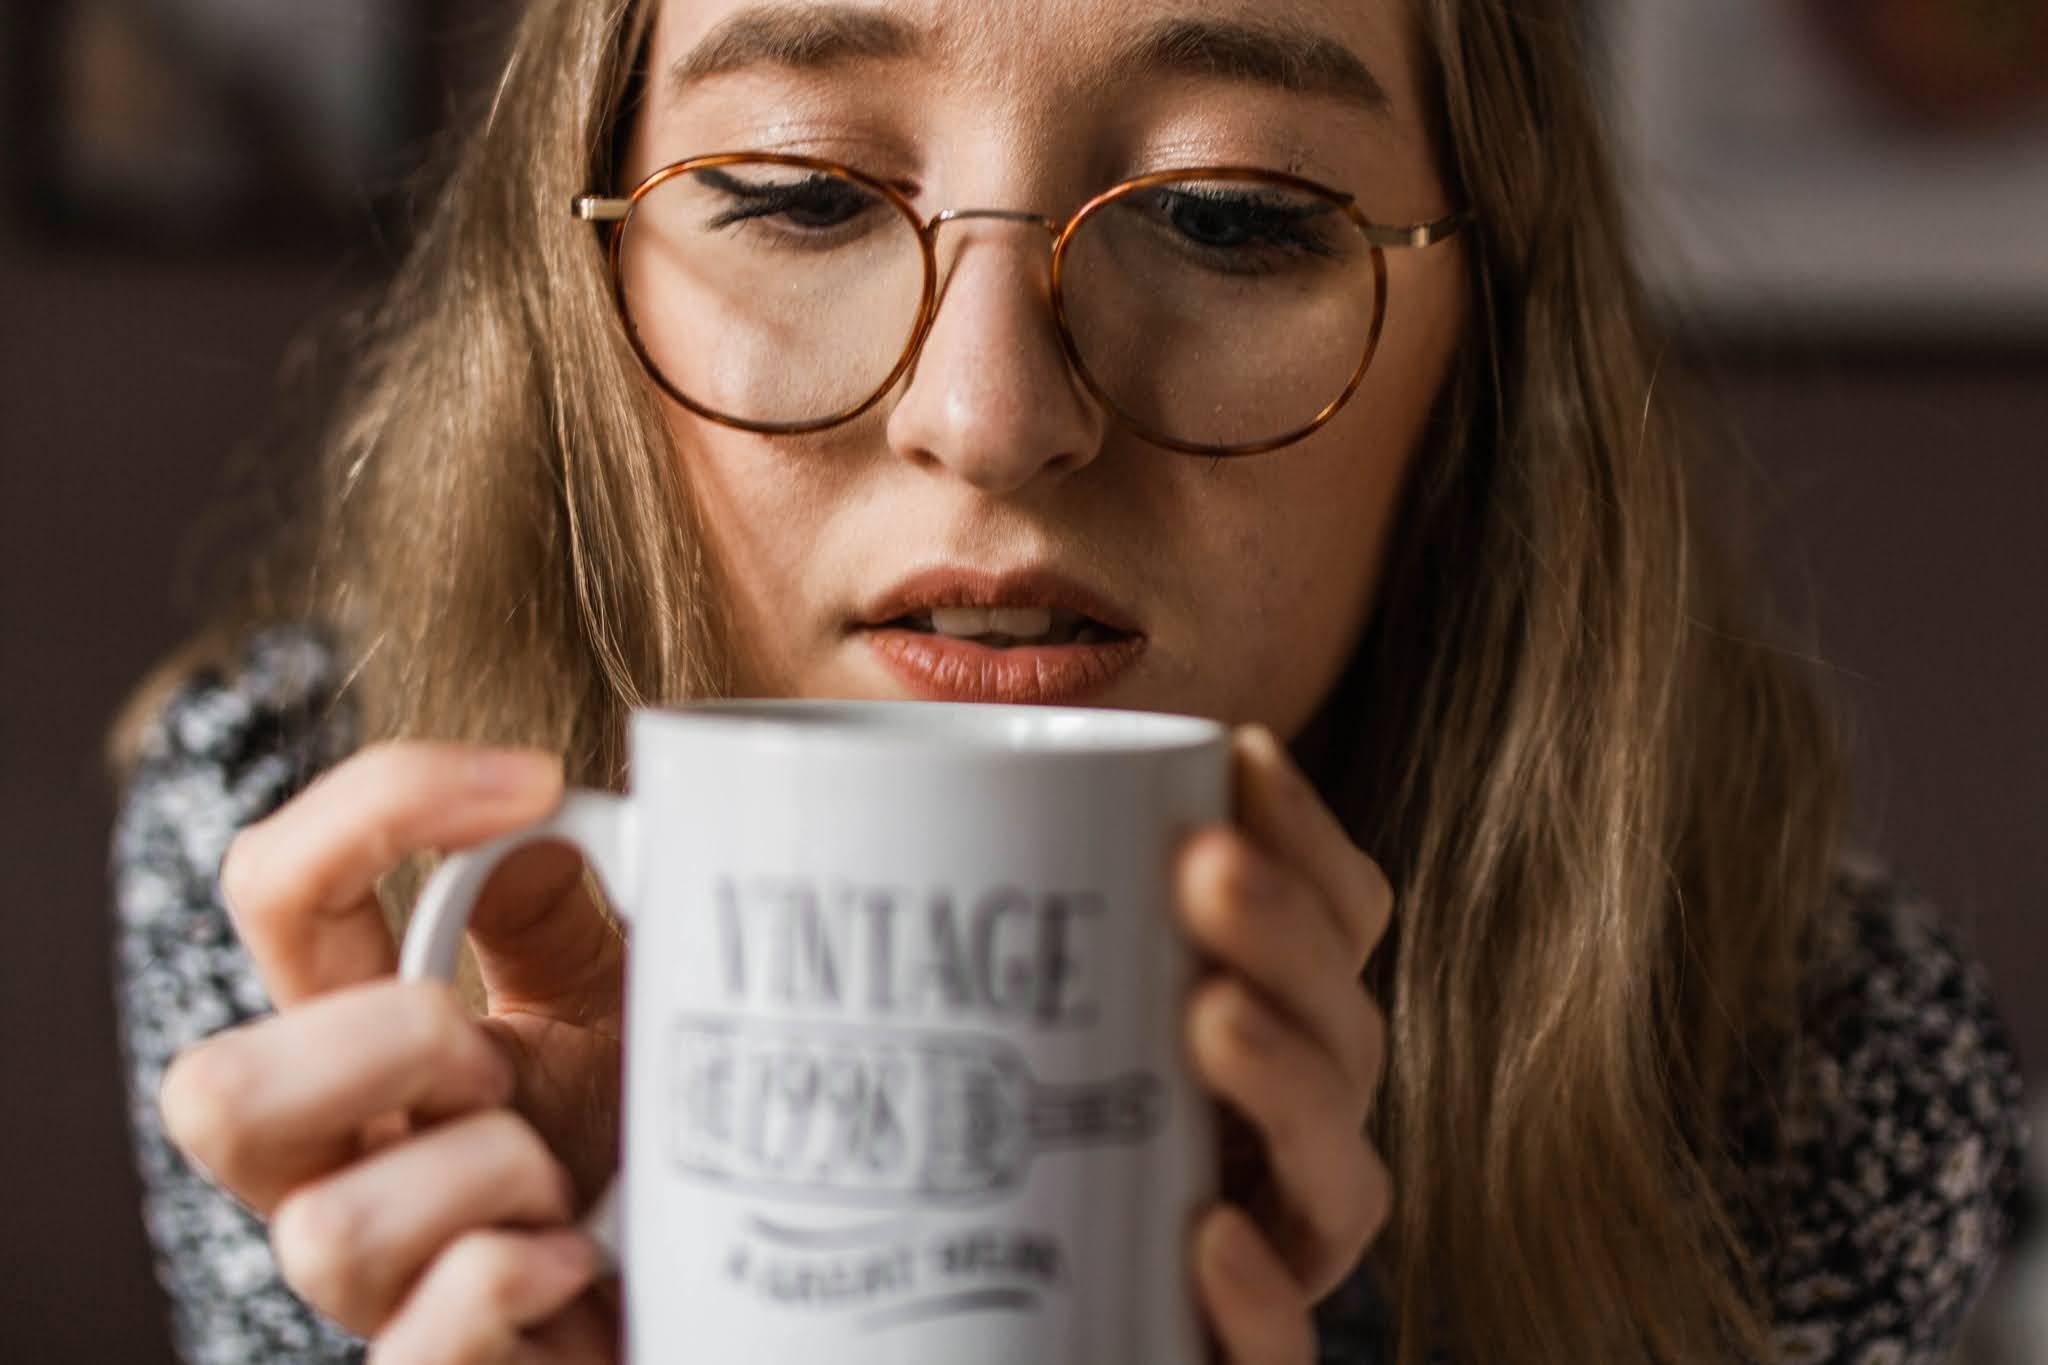 blonde girl with glasses holding white mug